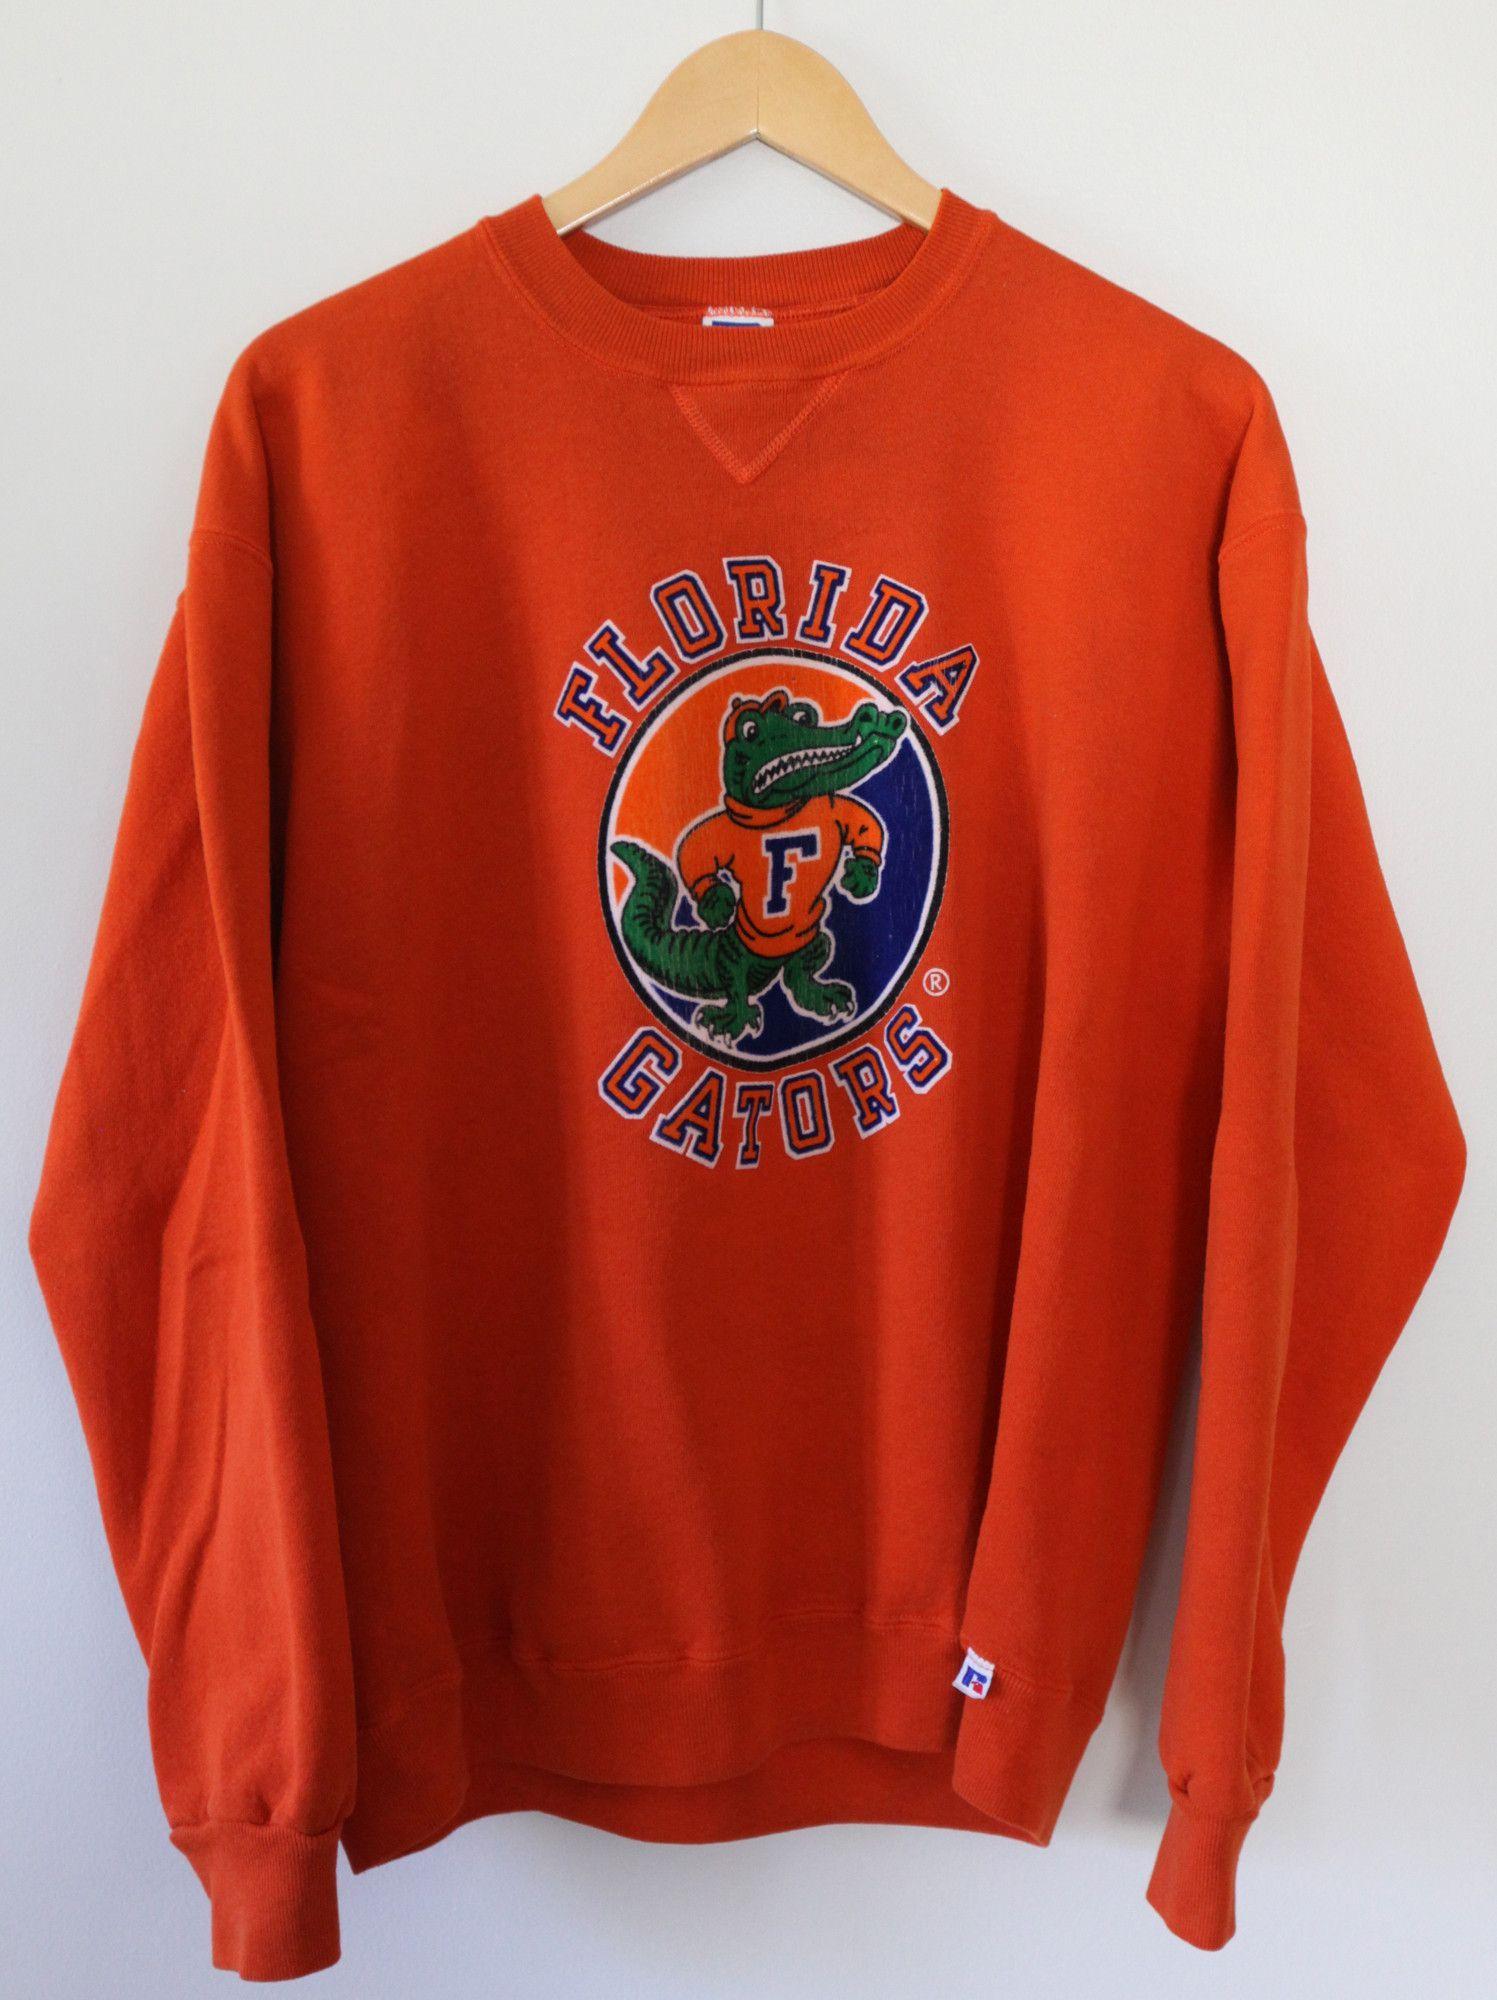 Sonny Buffalo Sweatshirt Outfit College Sweatshirt Outfit Sweatshirts [ 2000 x 1497 Pixel ]